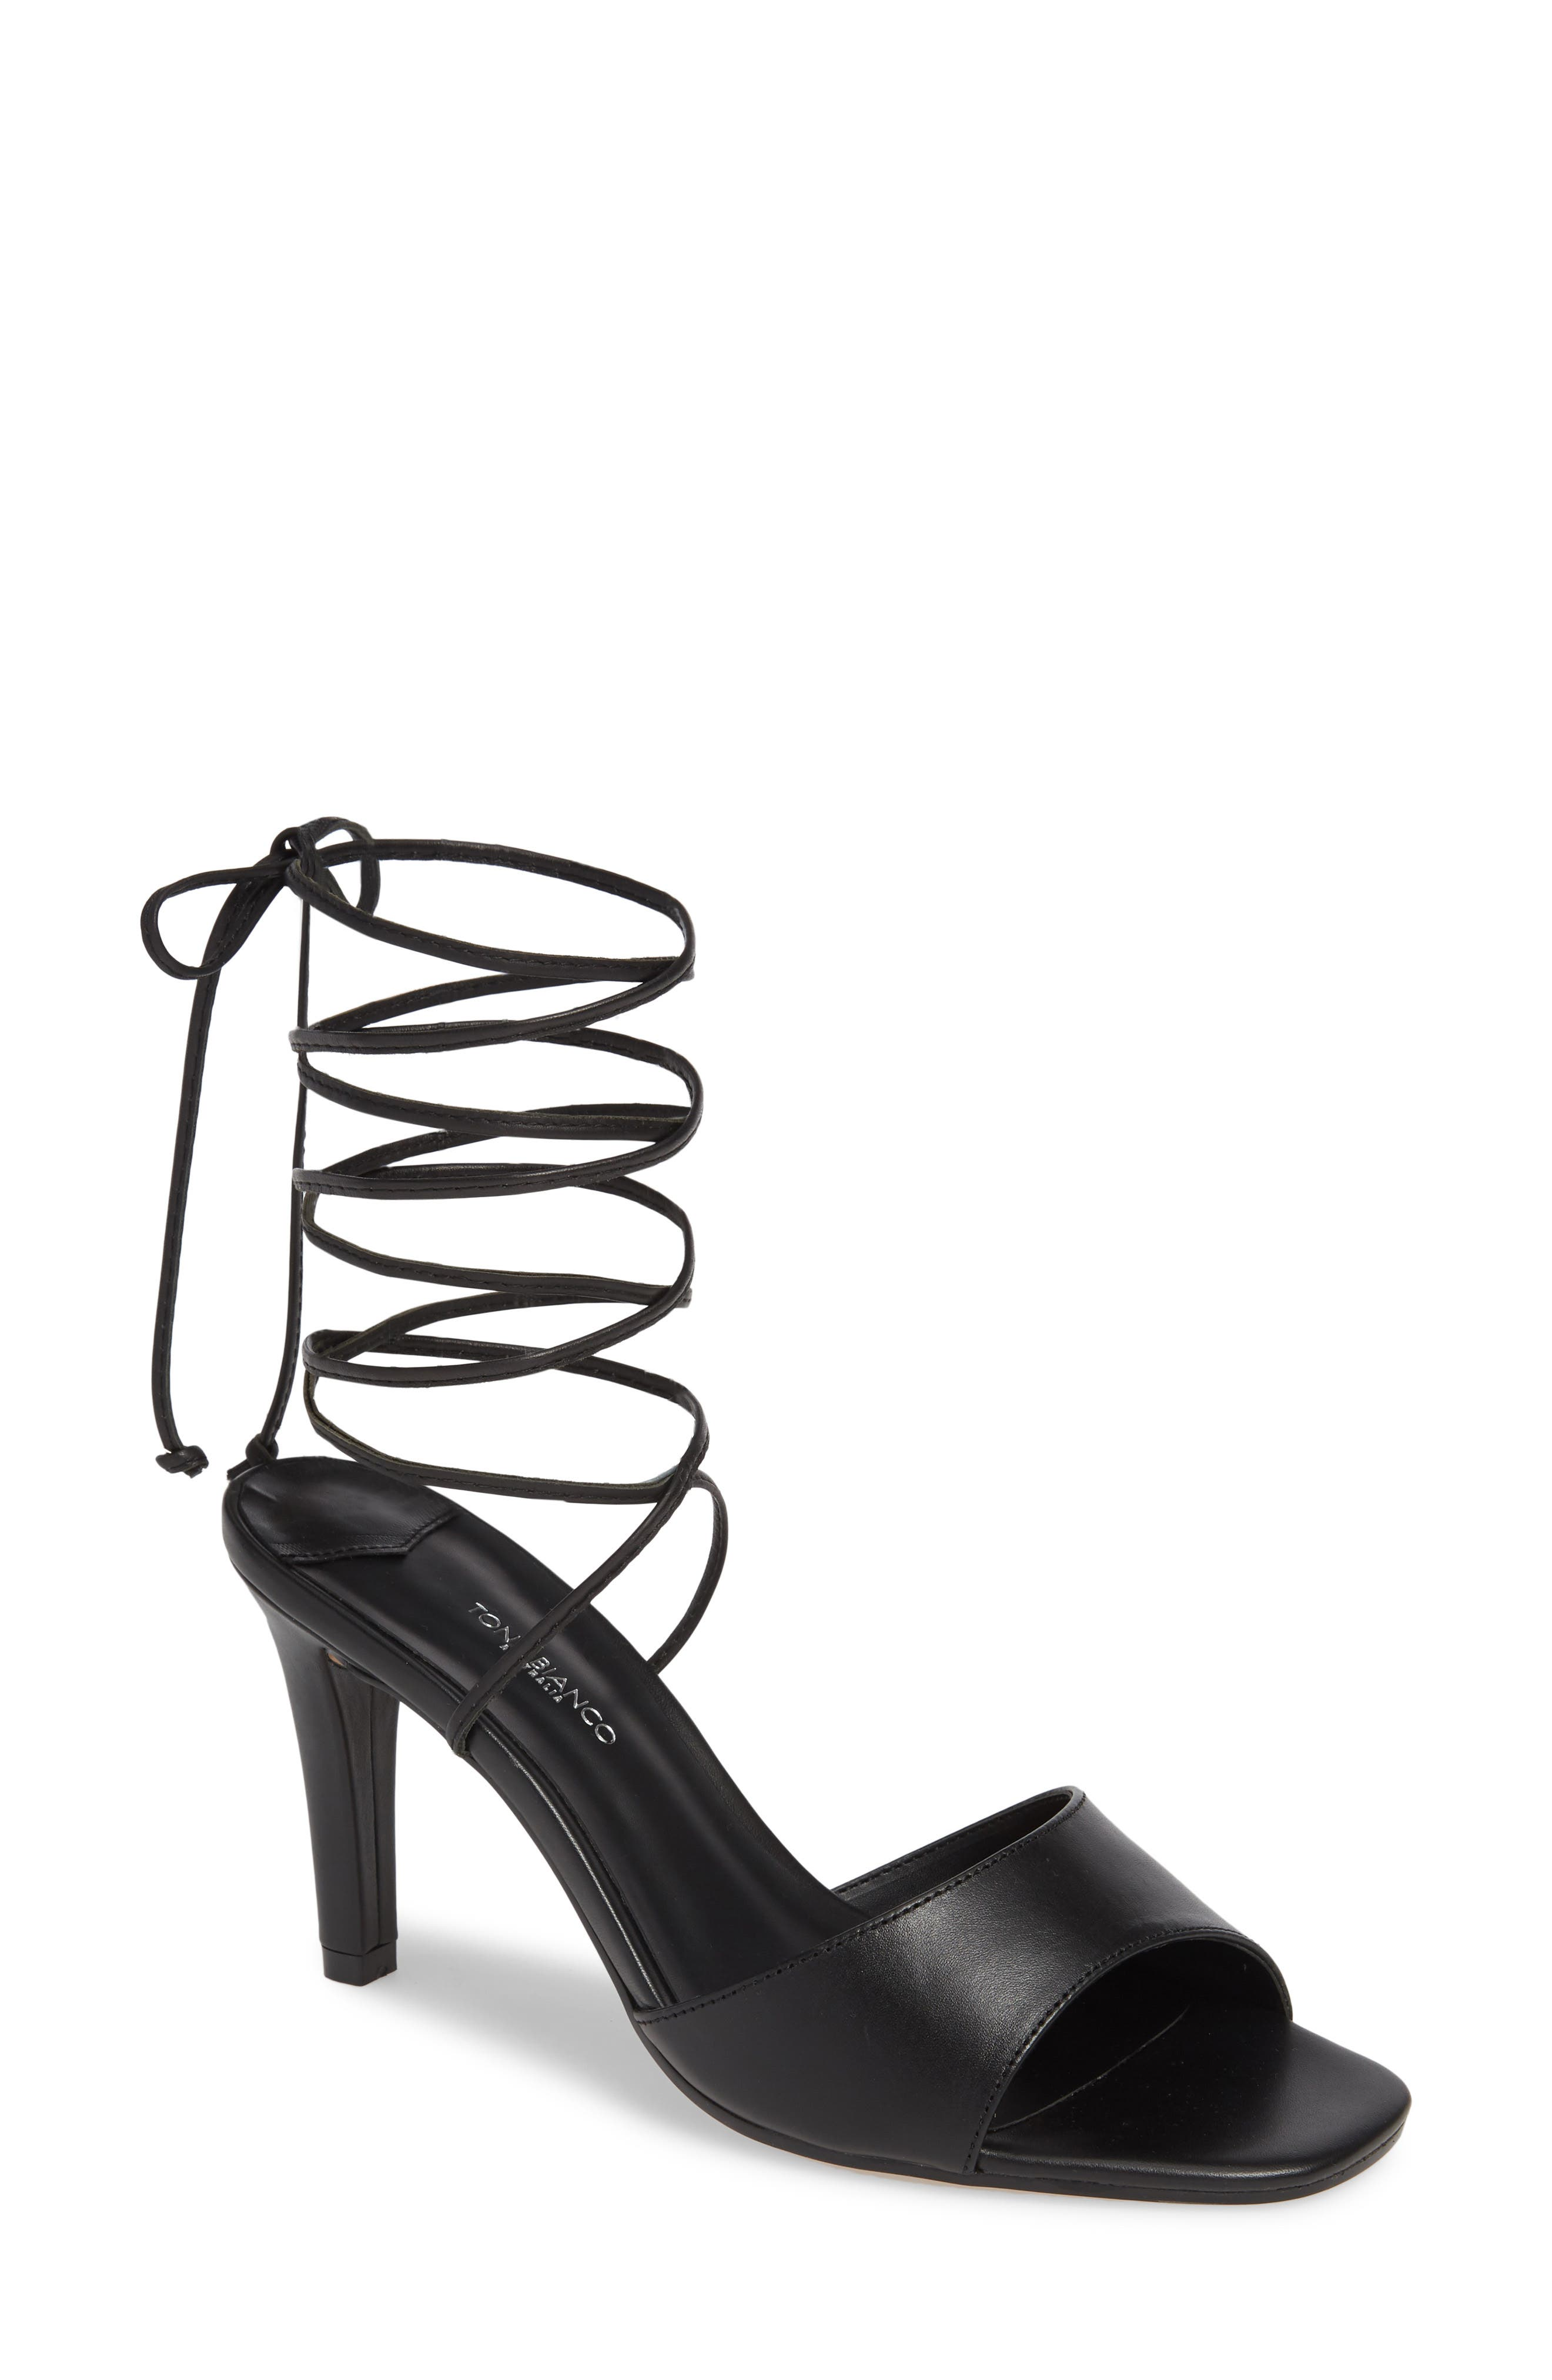 Tony Bianco Ruffian Wraparound Sandal- Black